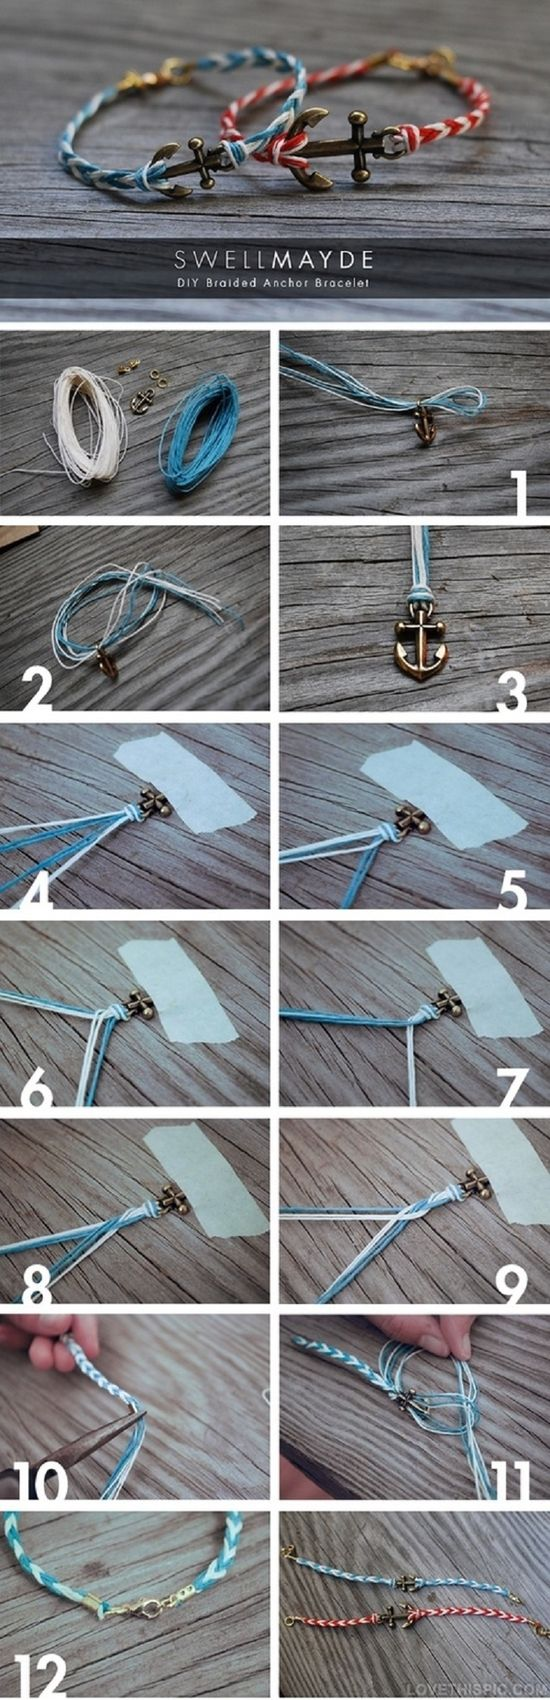 7 DIY Fashionable Bracelet